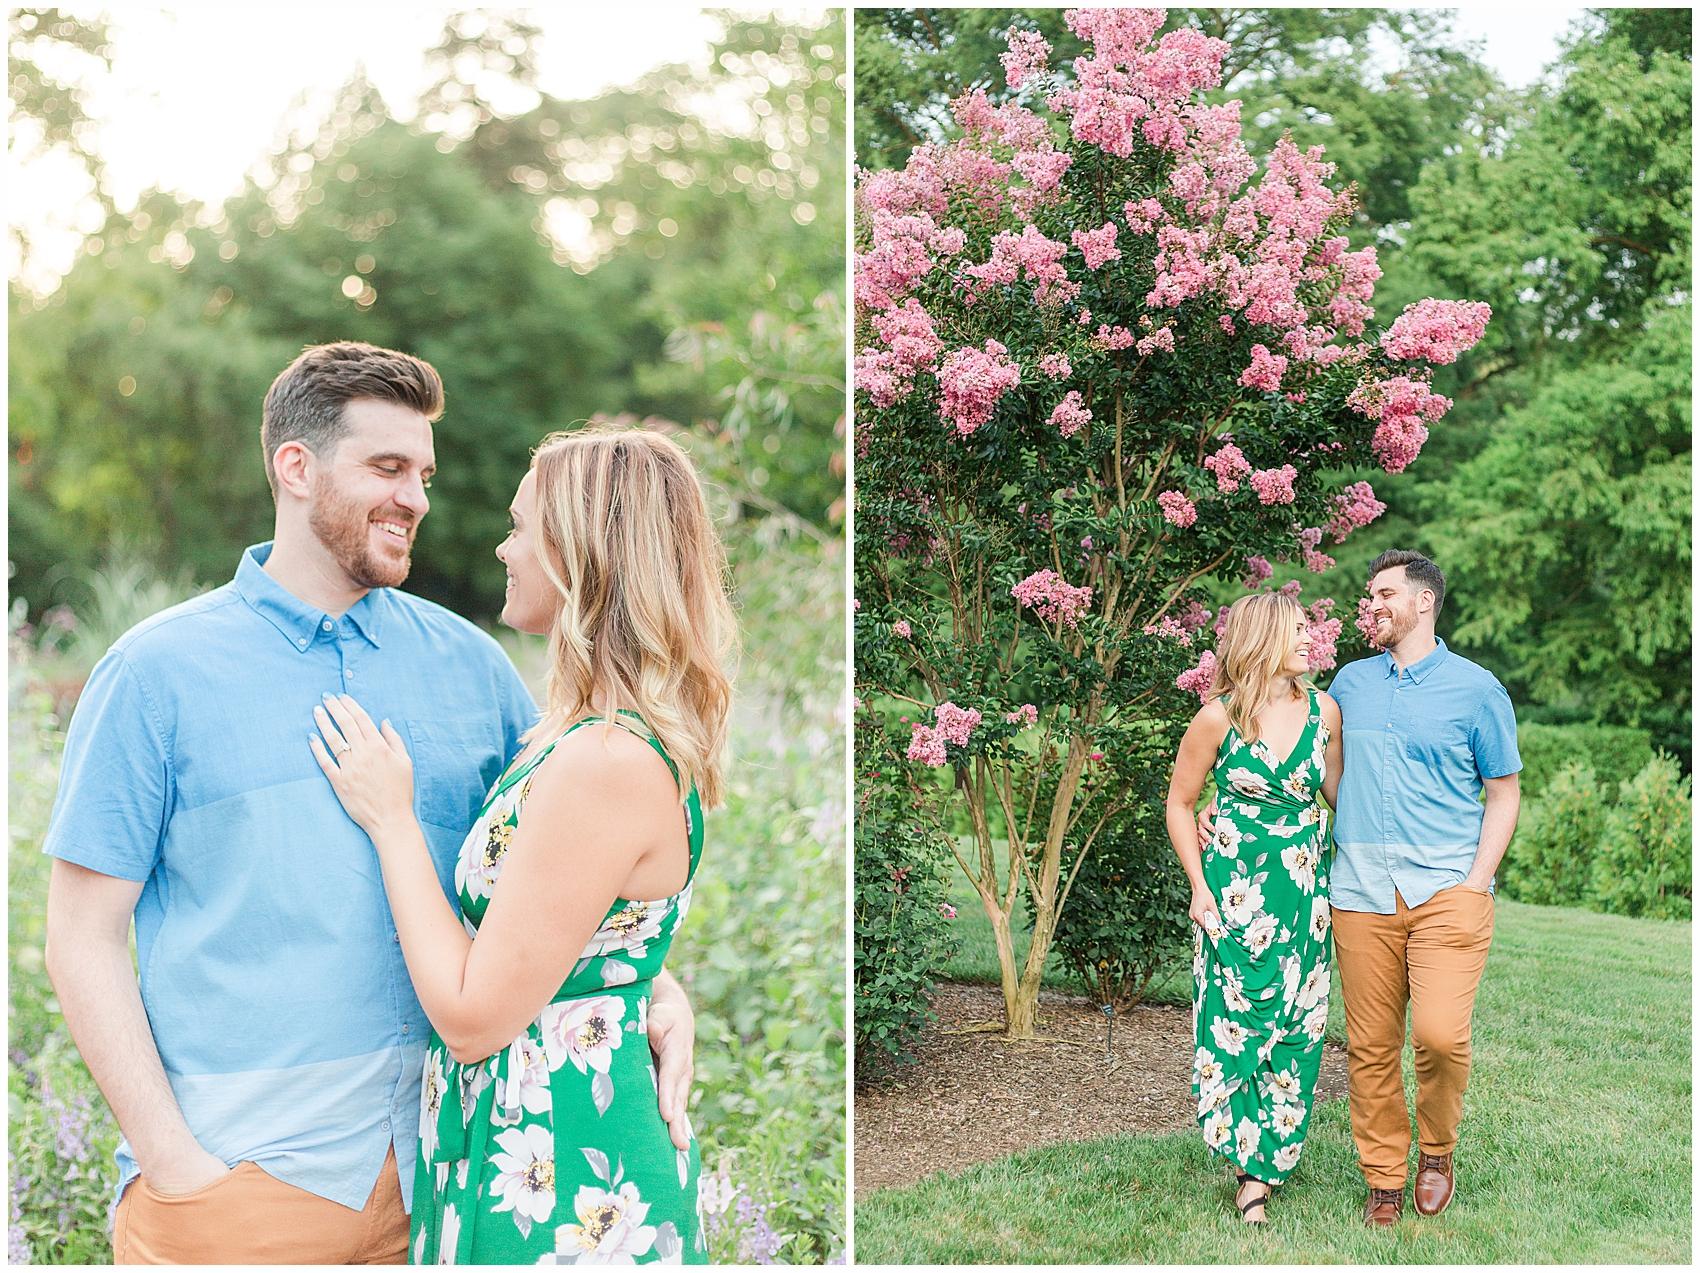 longwood-gardens-engagement-photographer_0004.jpg